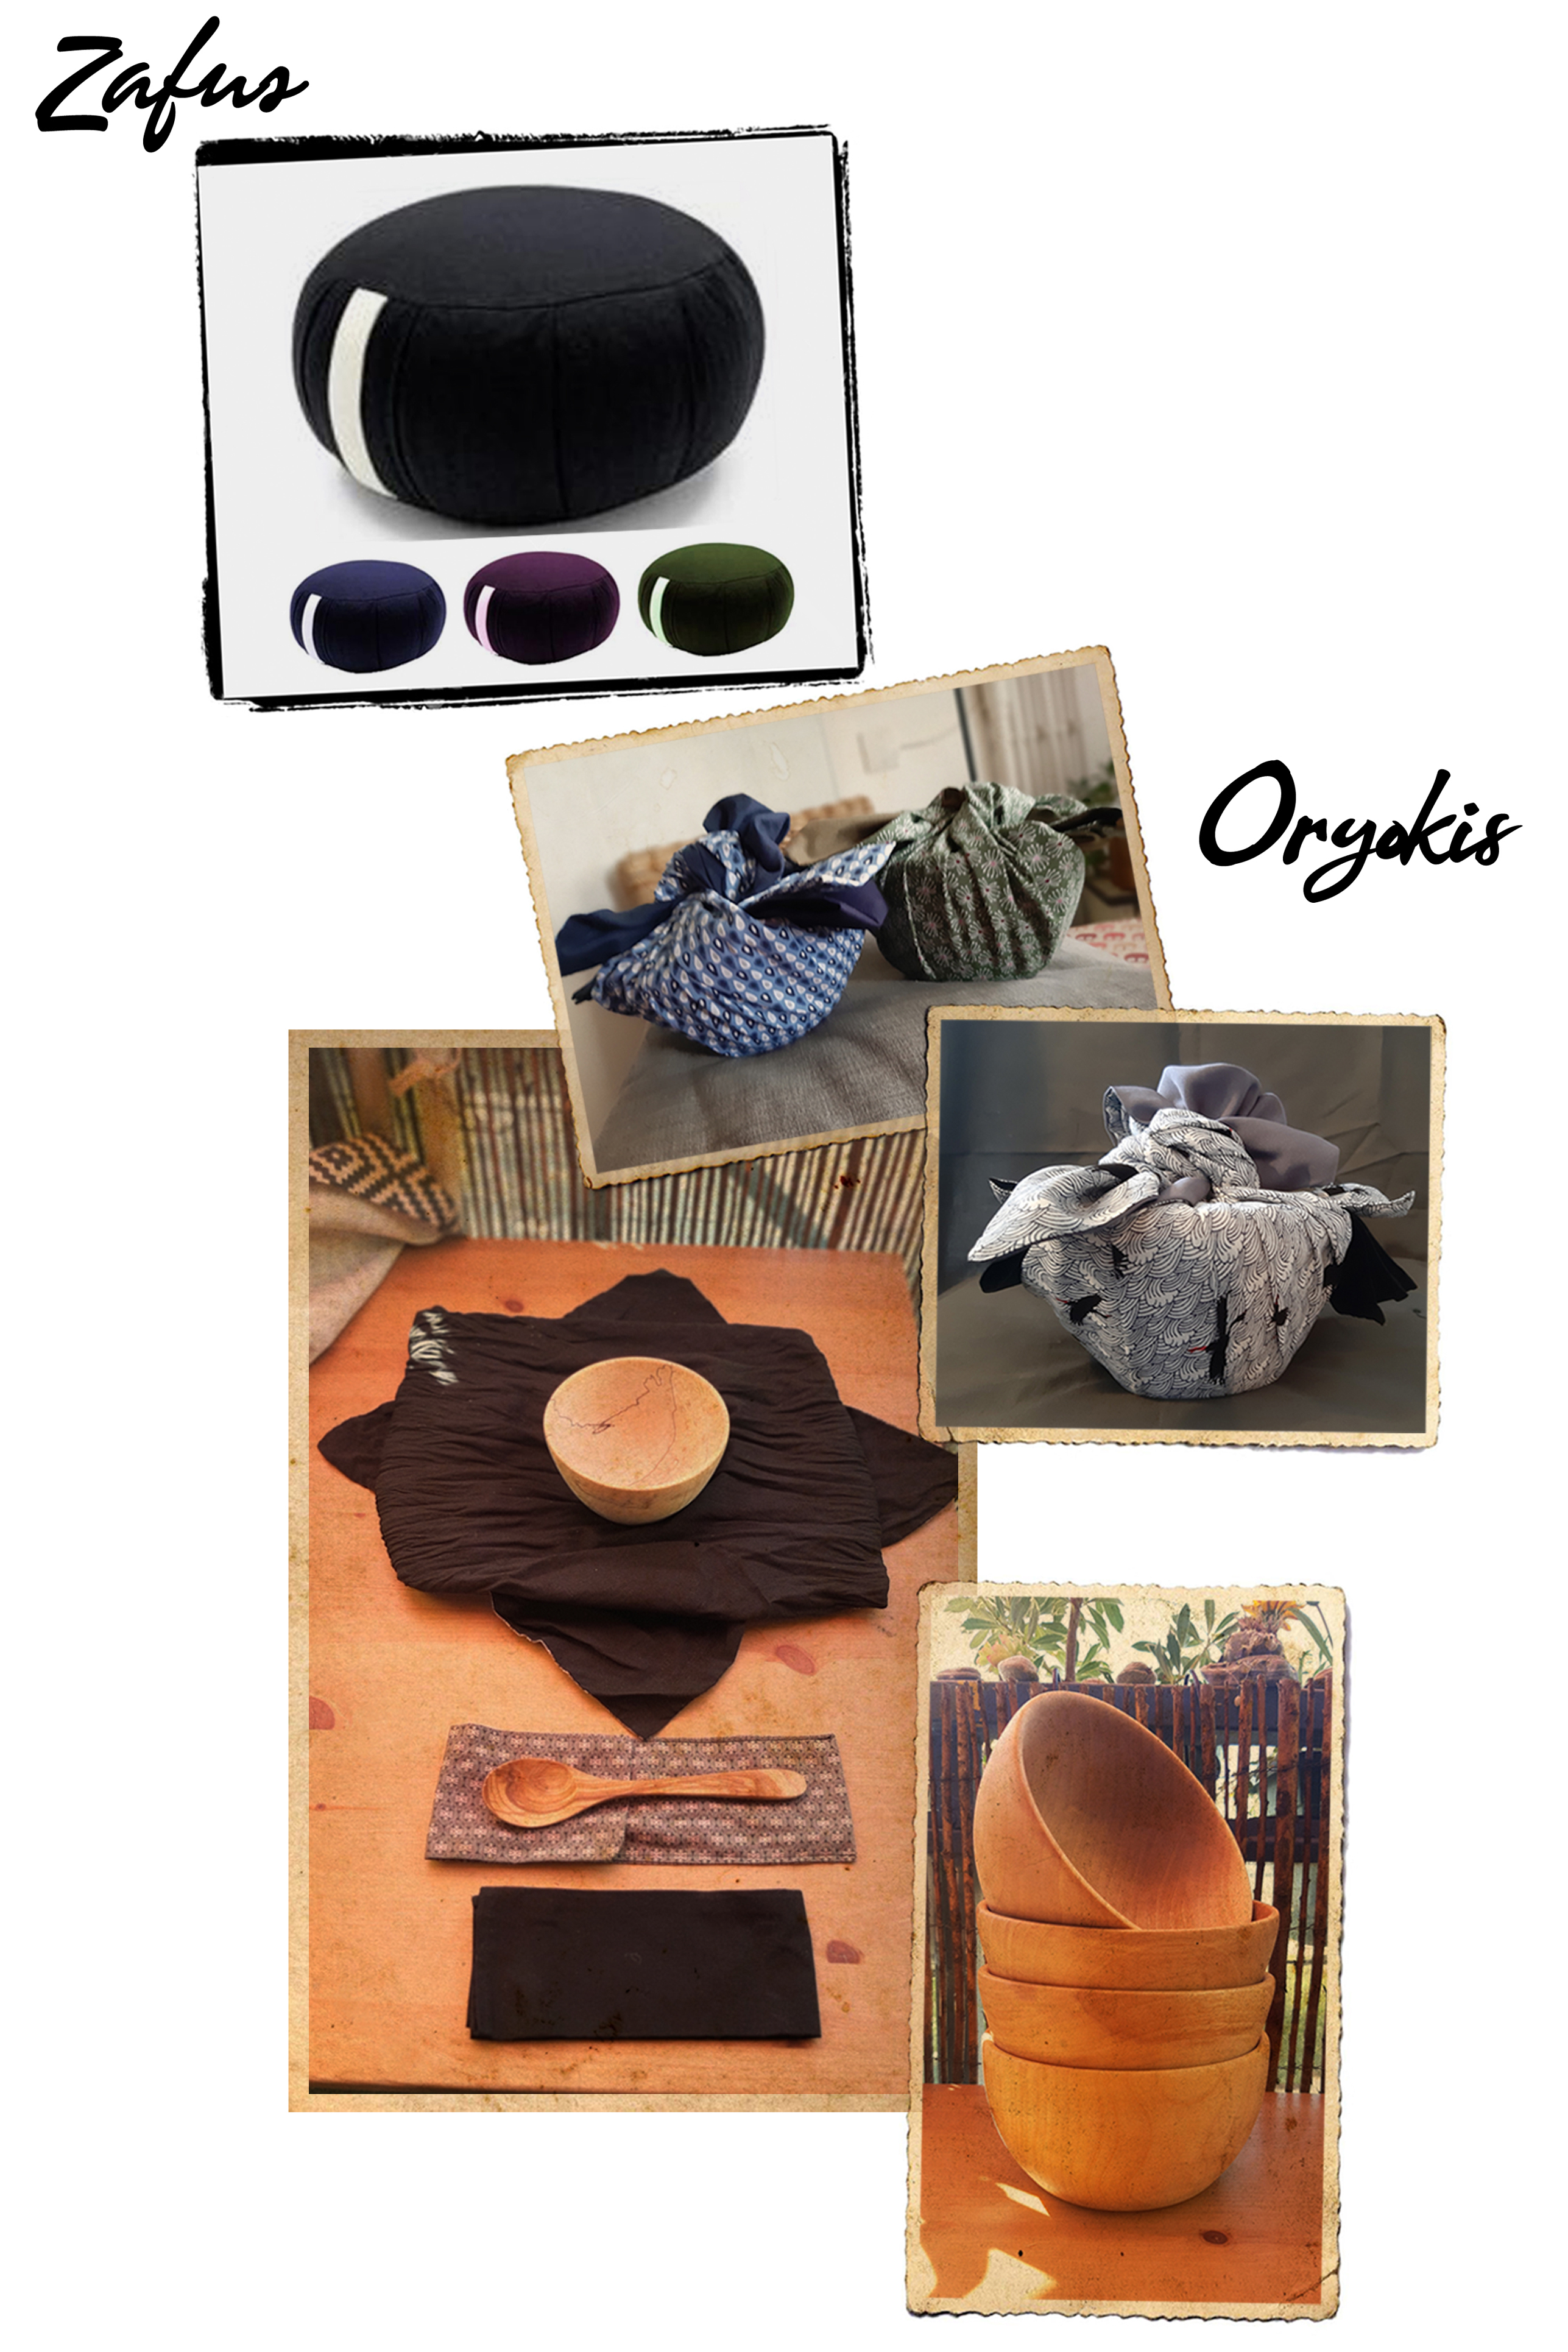 Fabrication de Zafus et Bols traditionnels (Oryokis) Zen